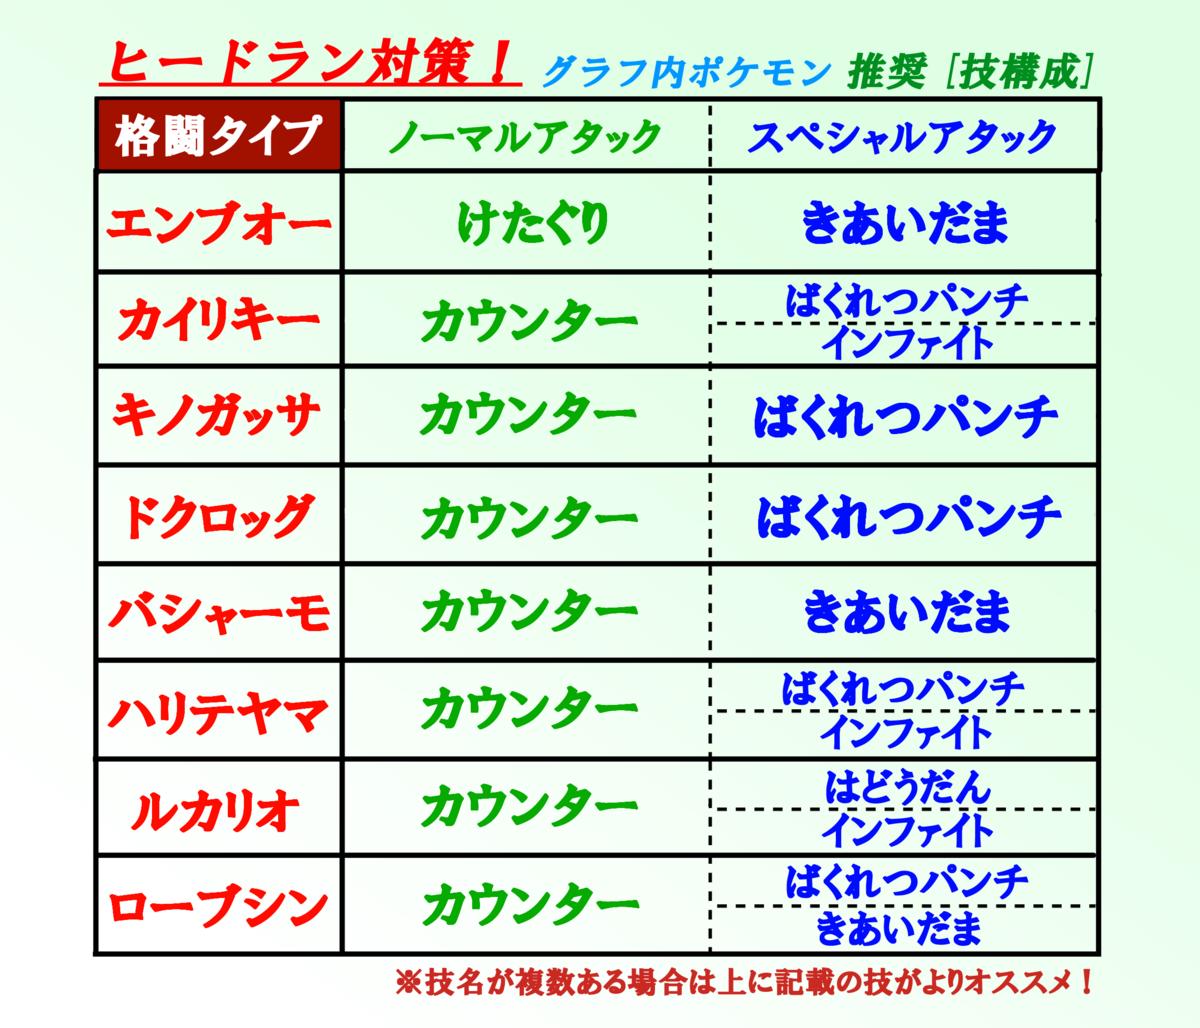 f:id:Kazumin0331:20200823000530p:plain